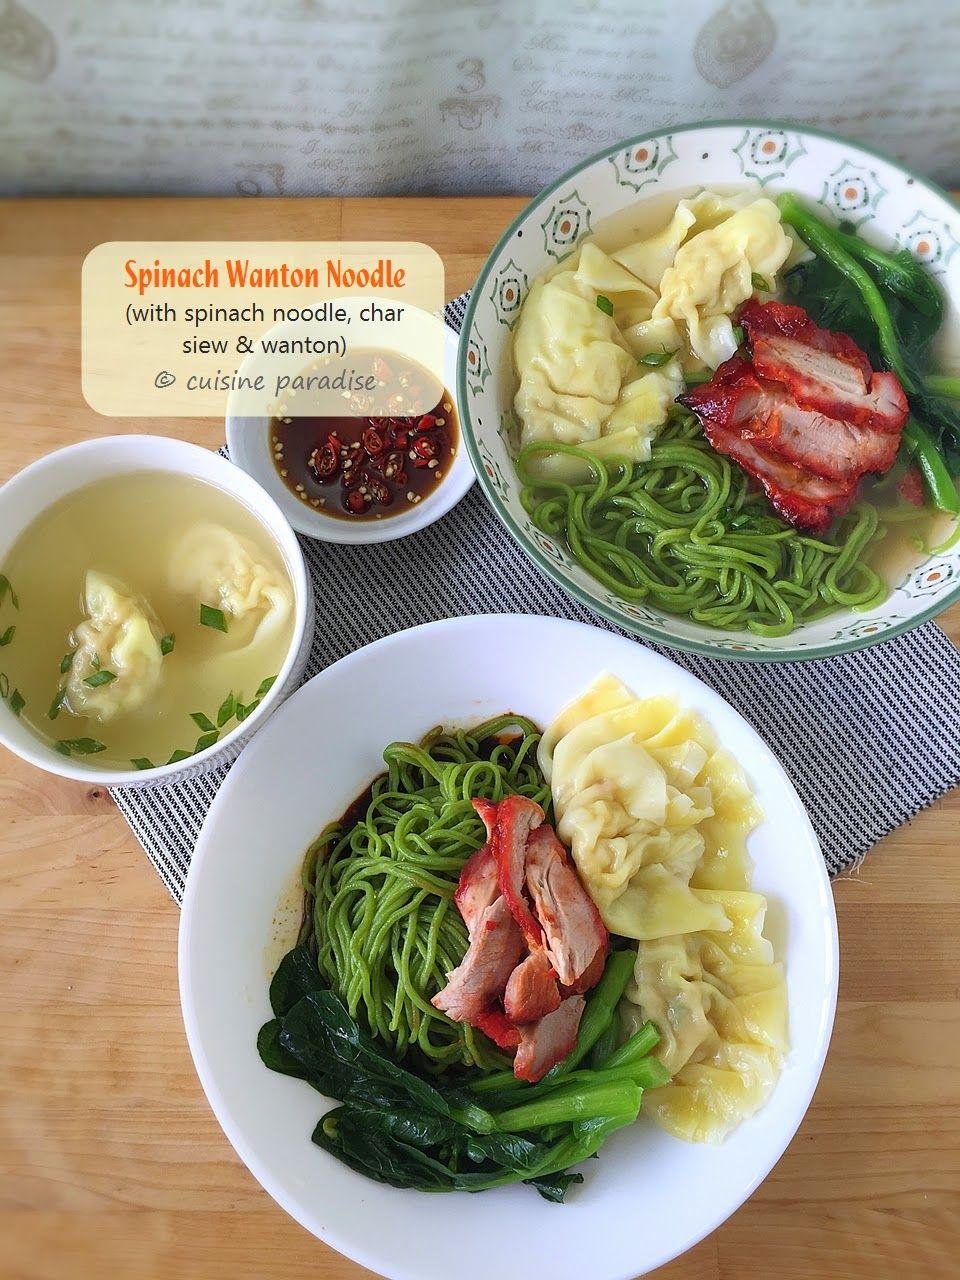 Cuisine paradise singapore food blog recipes reviews and travel cuisine paradise singapore food blog recipes reviews and travel 3 recipes forumfinder Choice Image